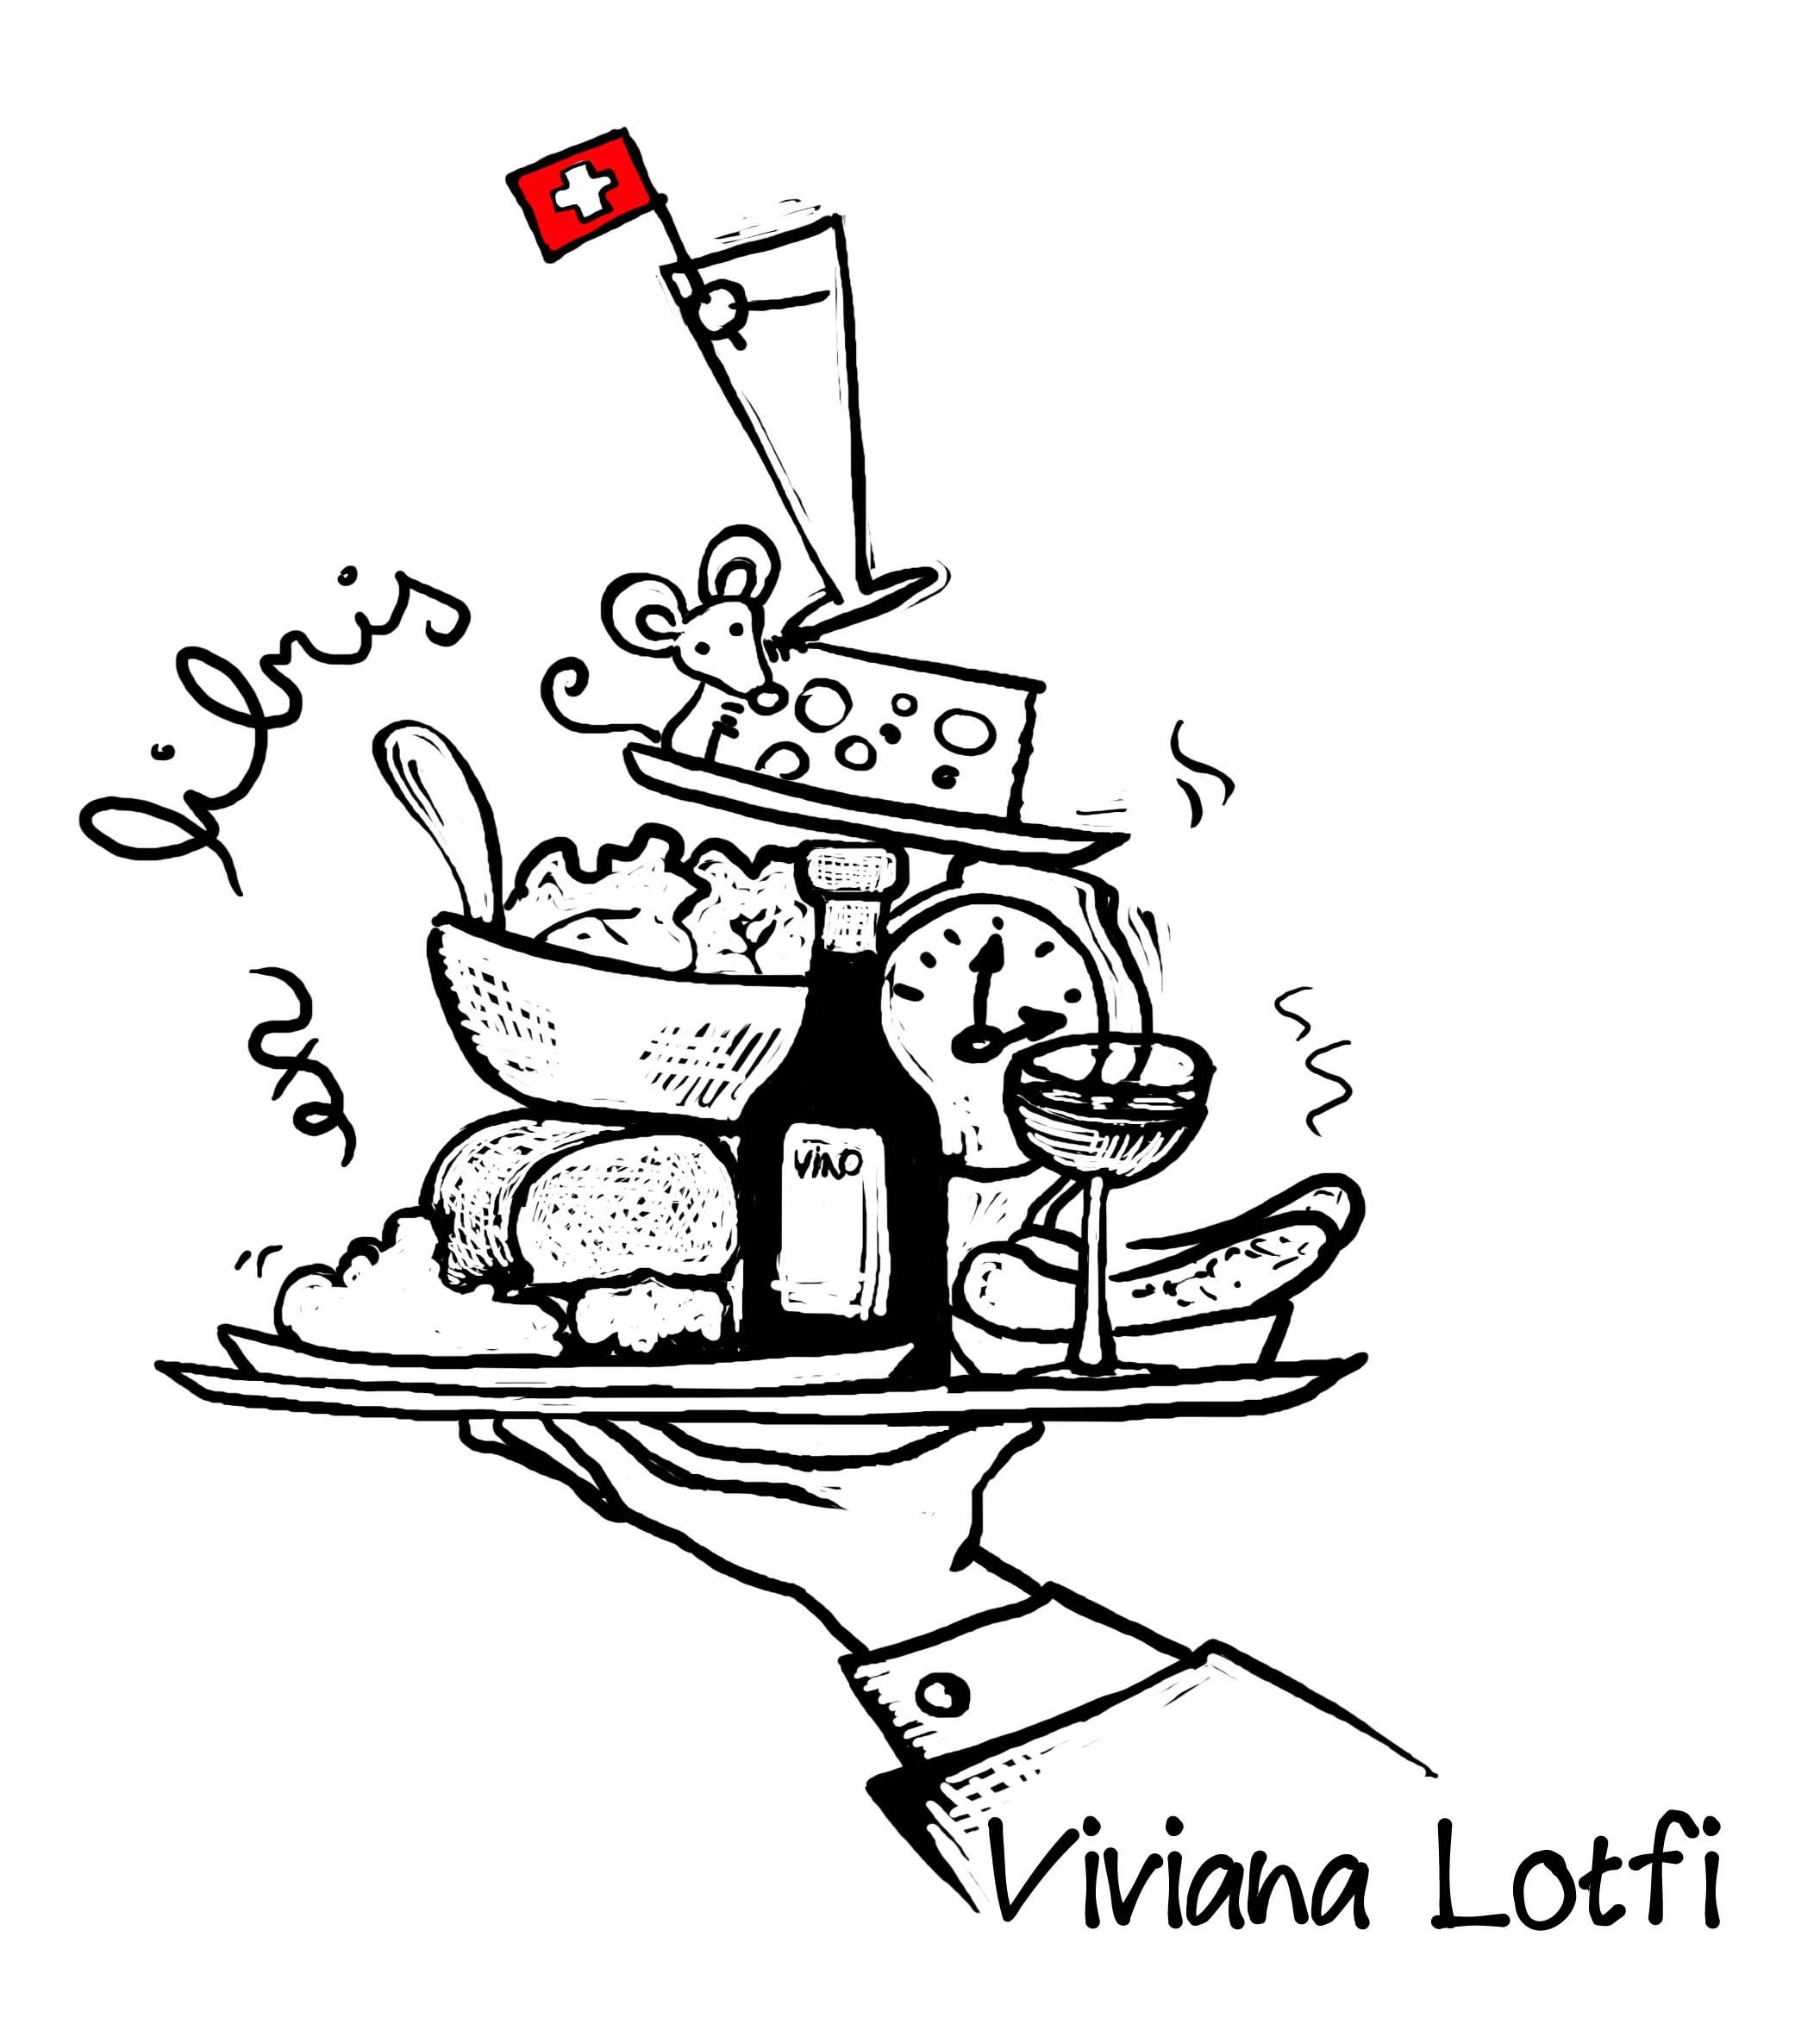 Ex libris Viviana Lotfi